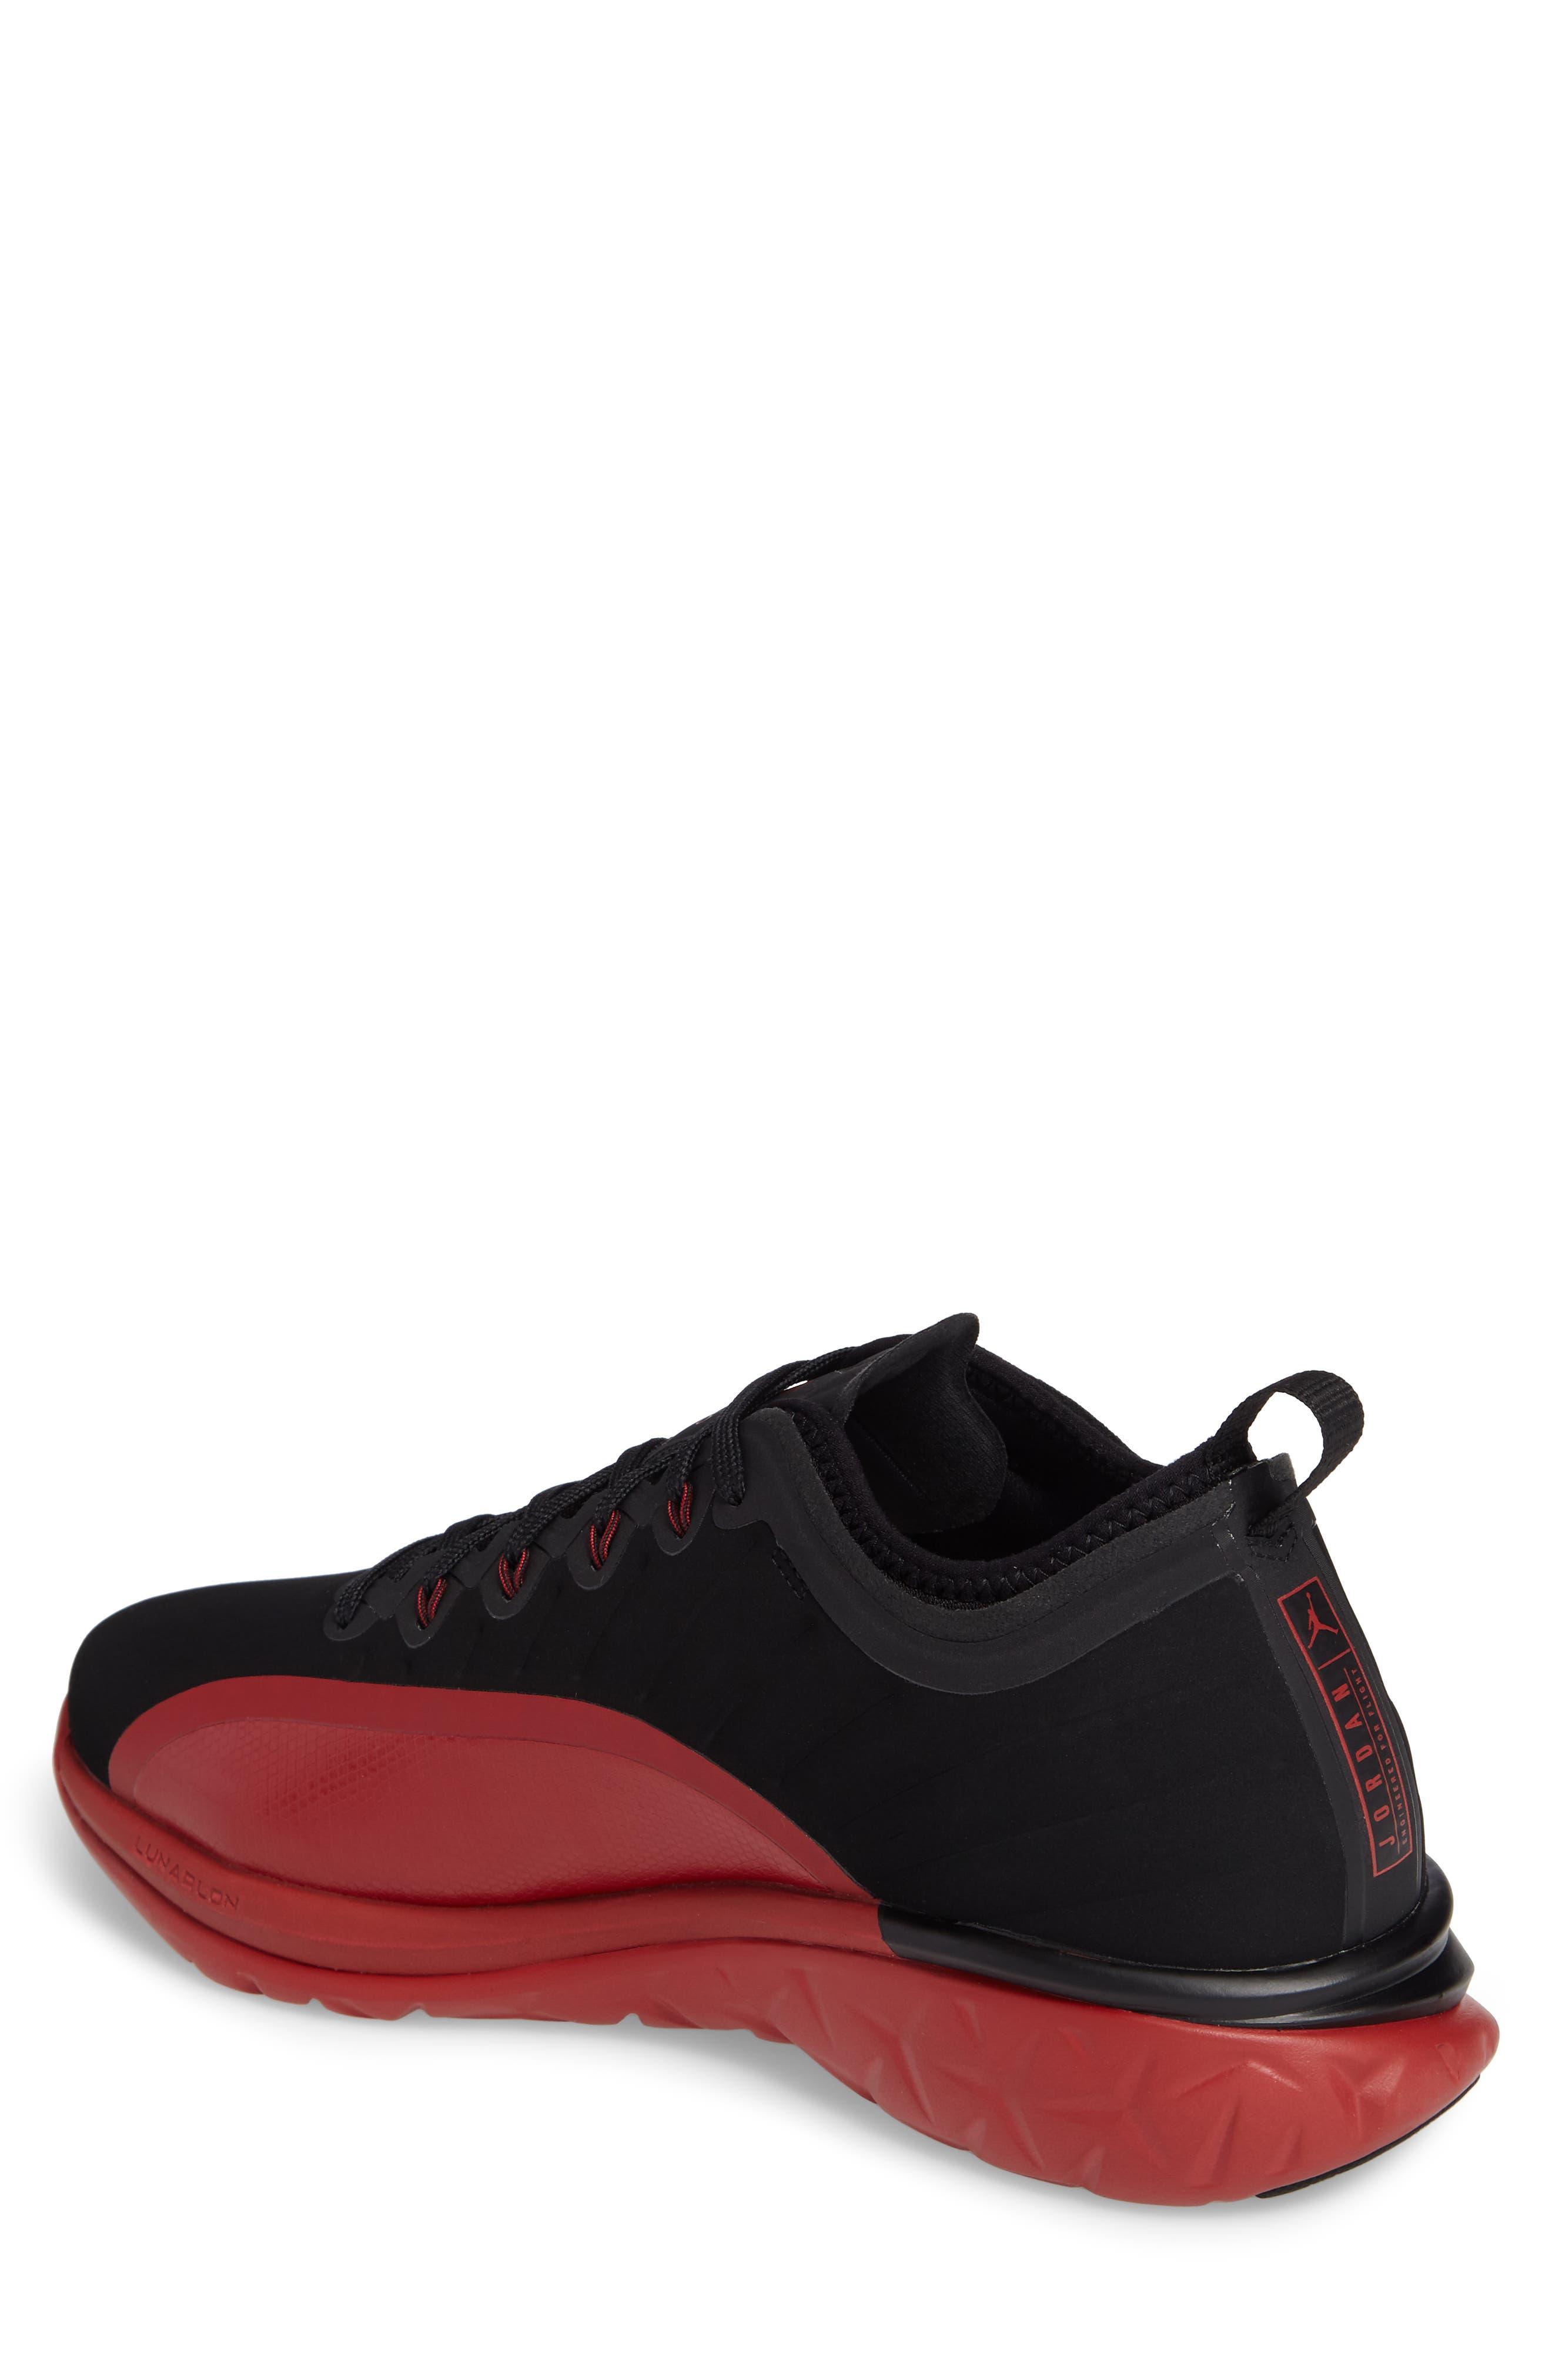 Jordan Trainer Prime Sneaker,                             Alternate thumbnail 2, color,                             006